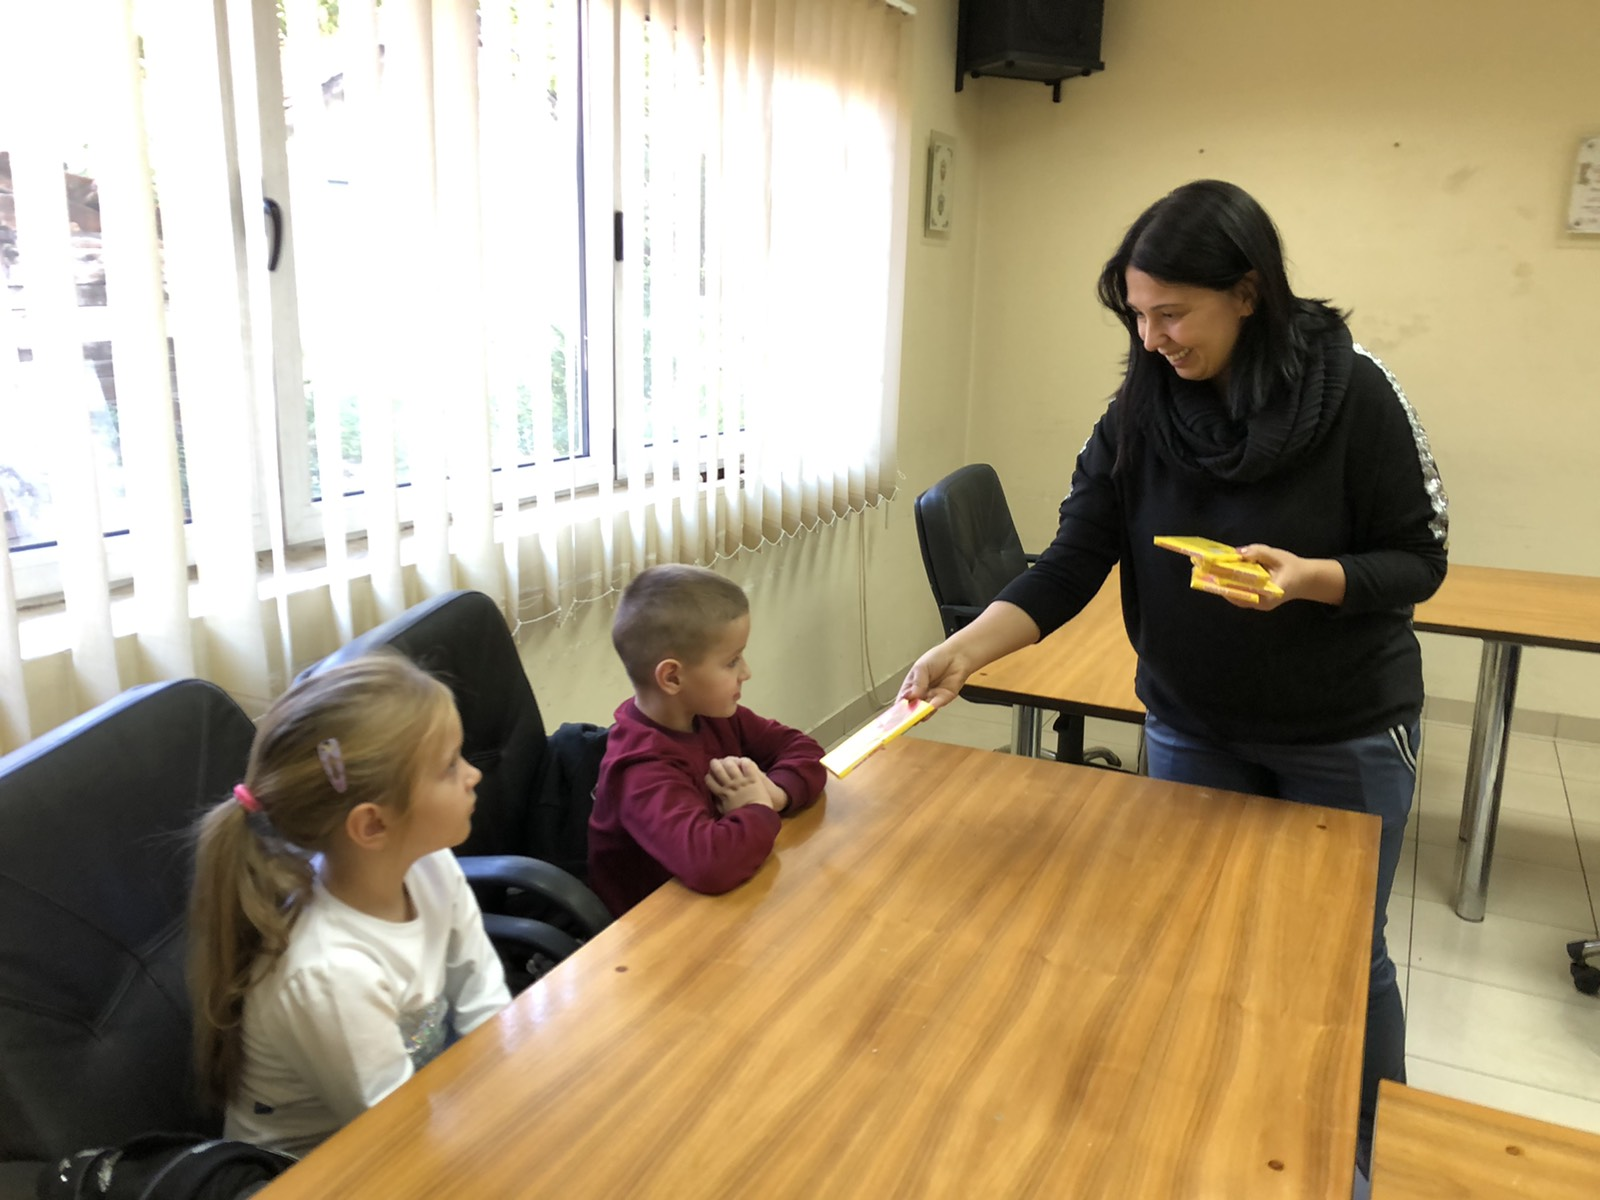 Predsednica podelila čokolade deci iz PU ,,Poletarac'', foto: D.M.